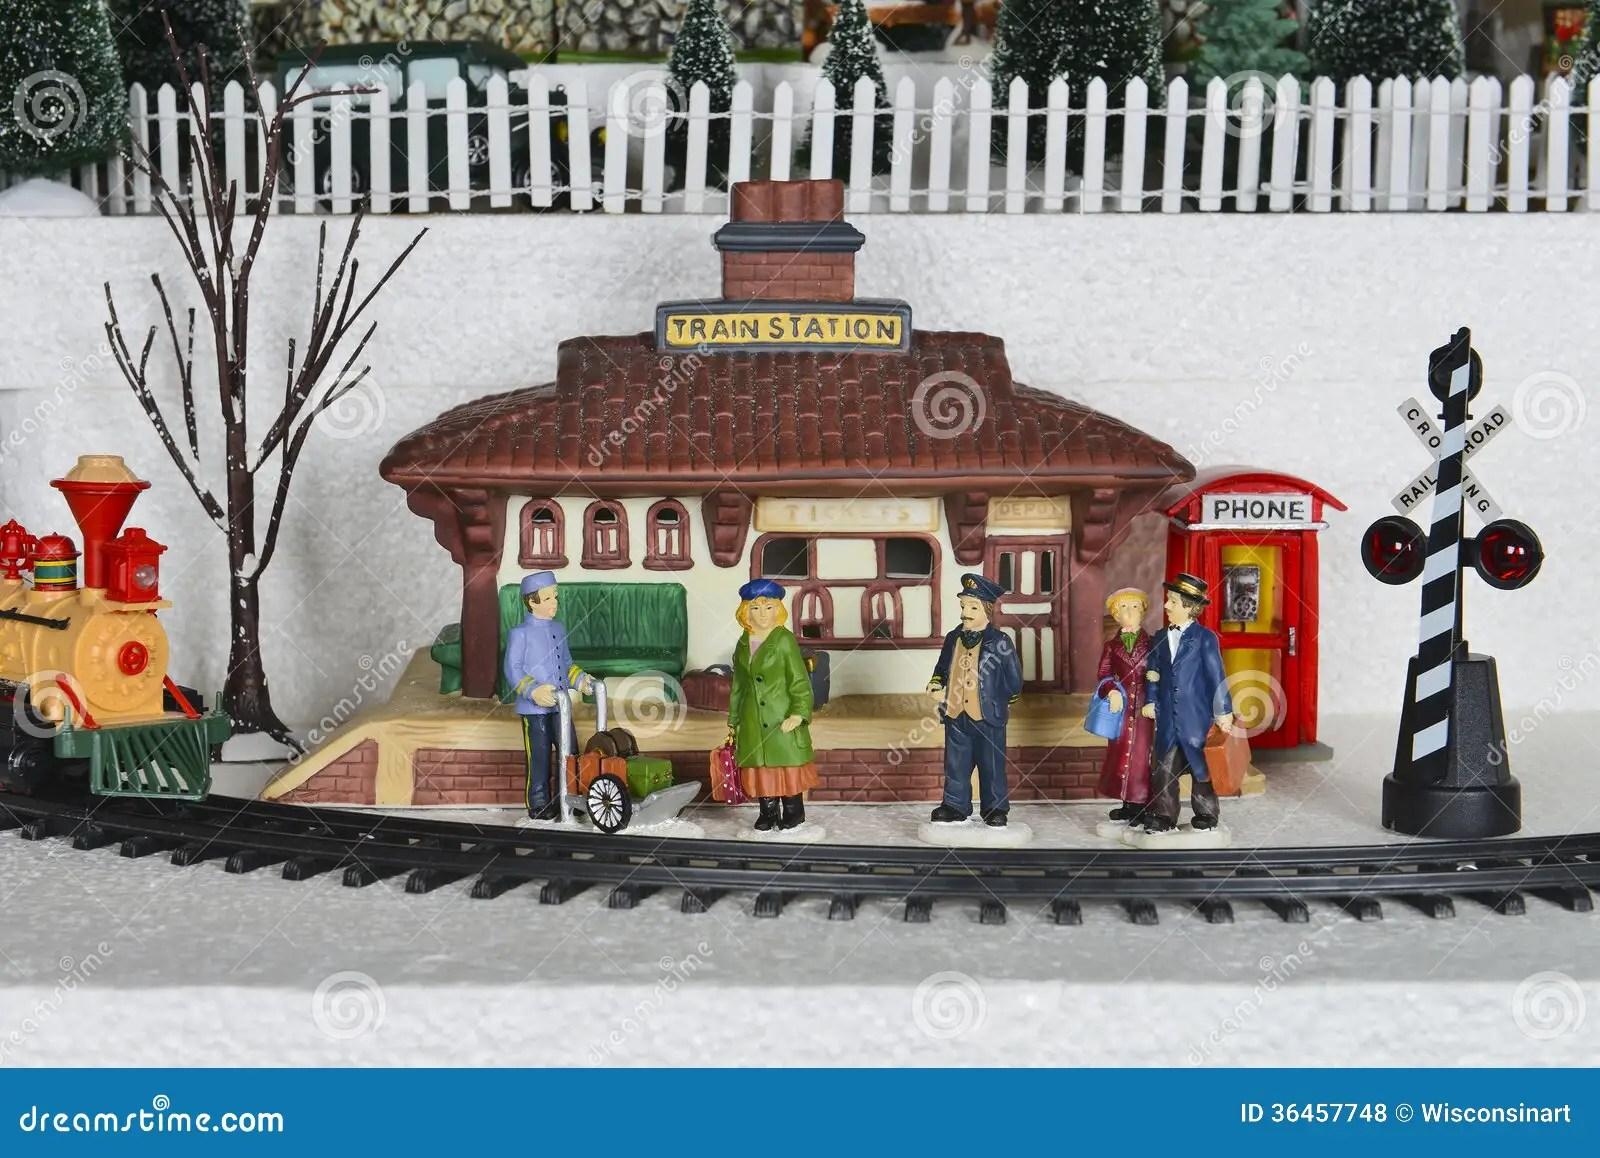 hight resolution of winter christmas village train station scene